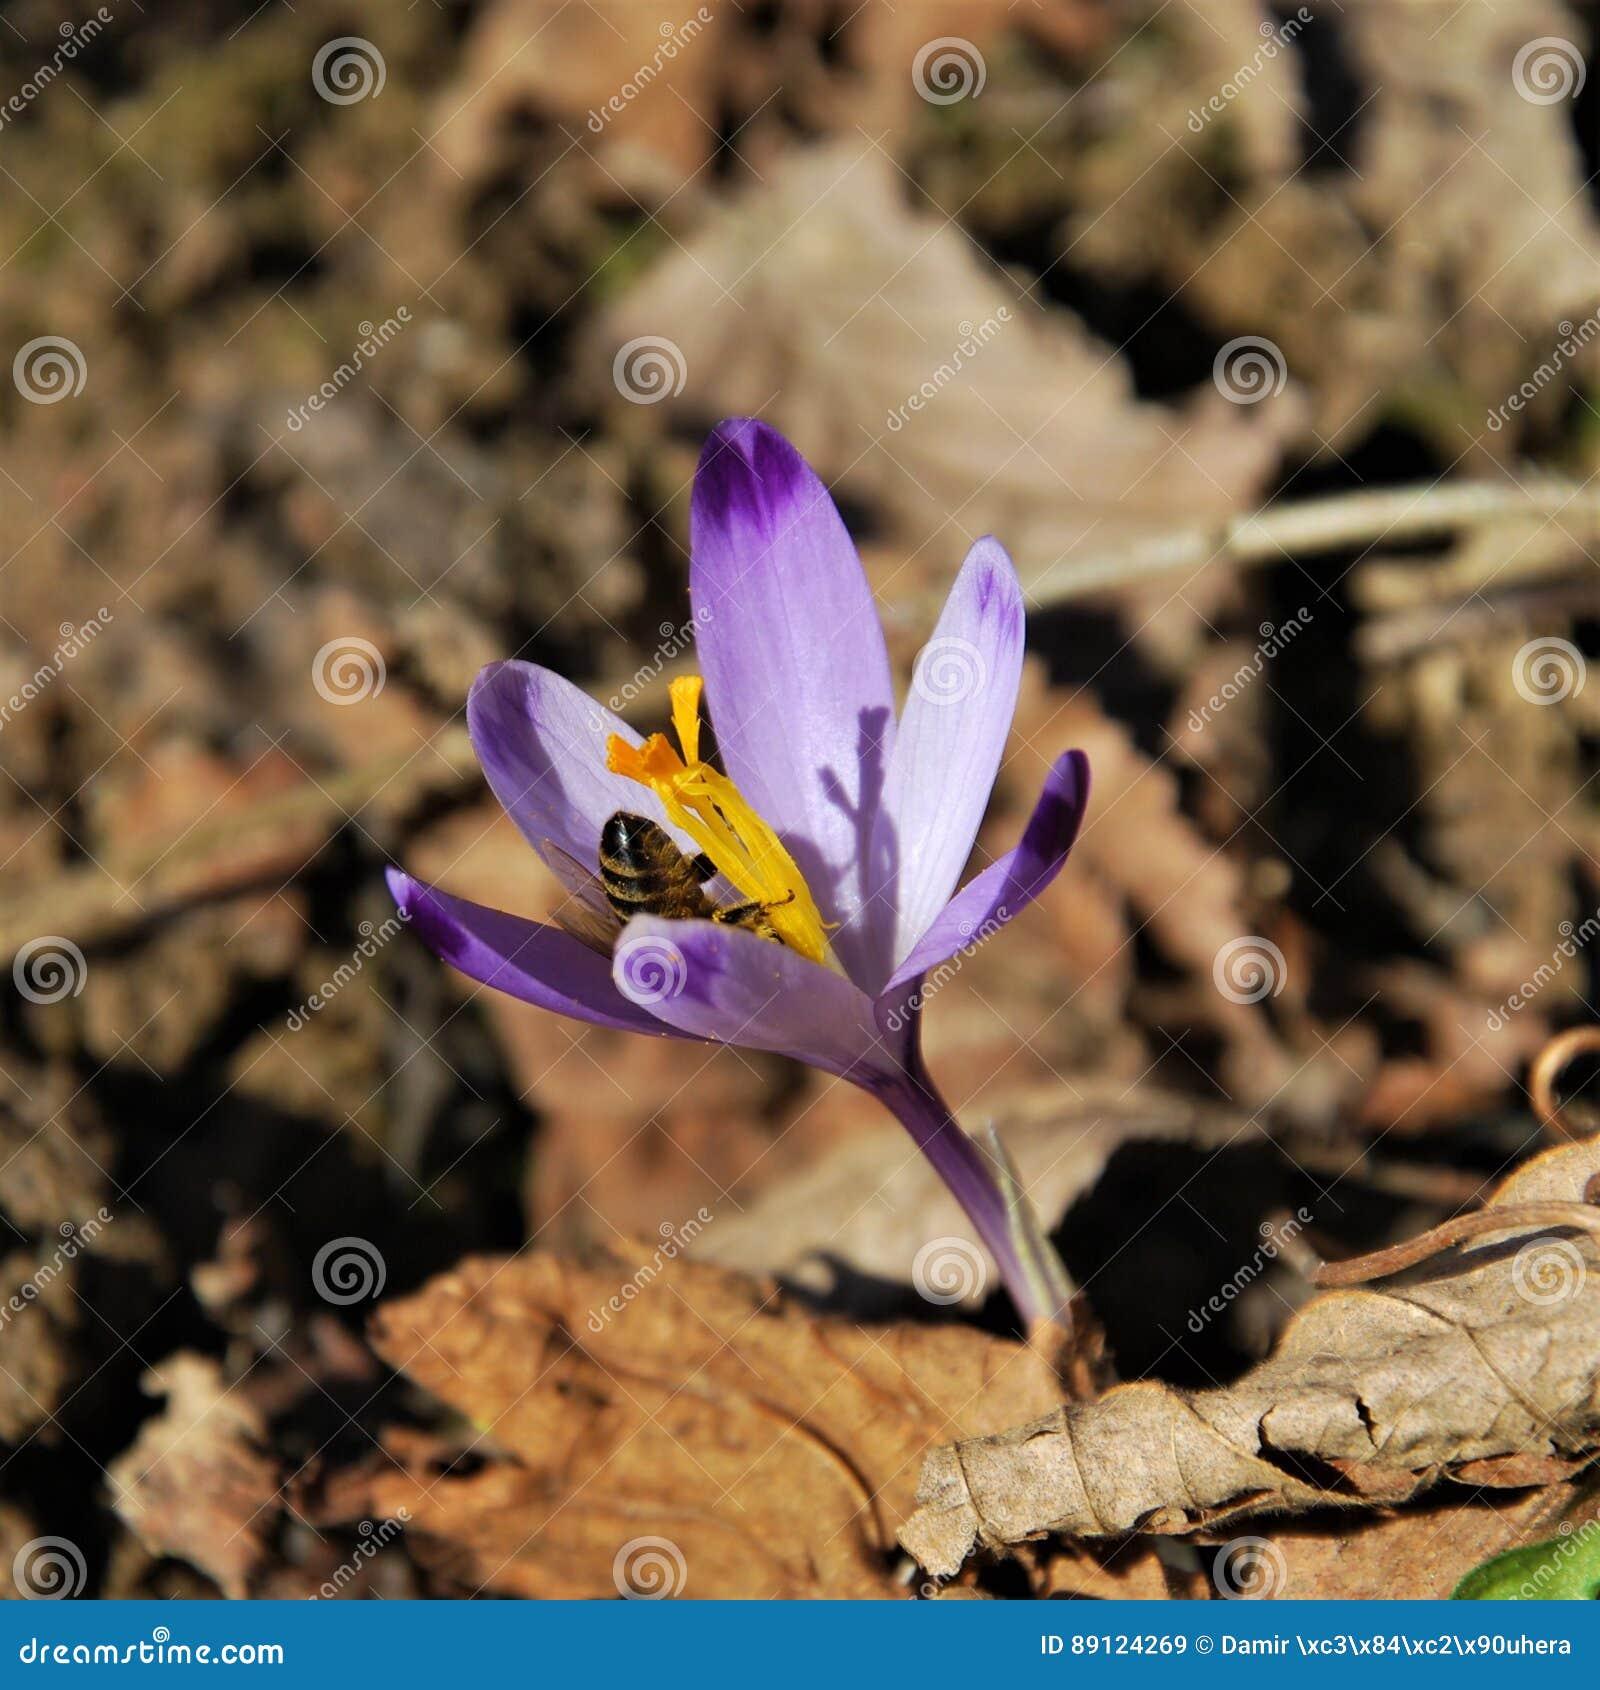 WIOSNA: Pszczoły, szafran i krokus/